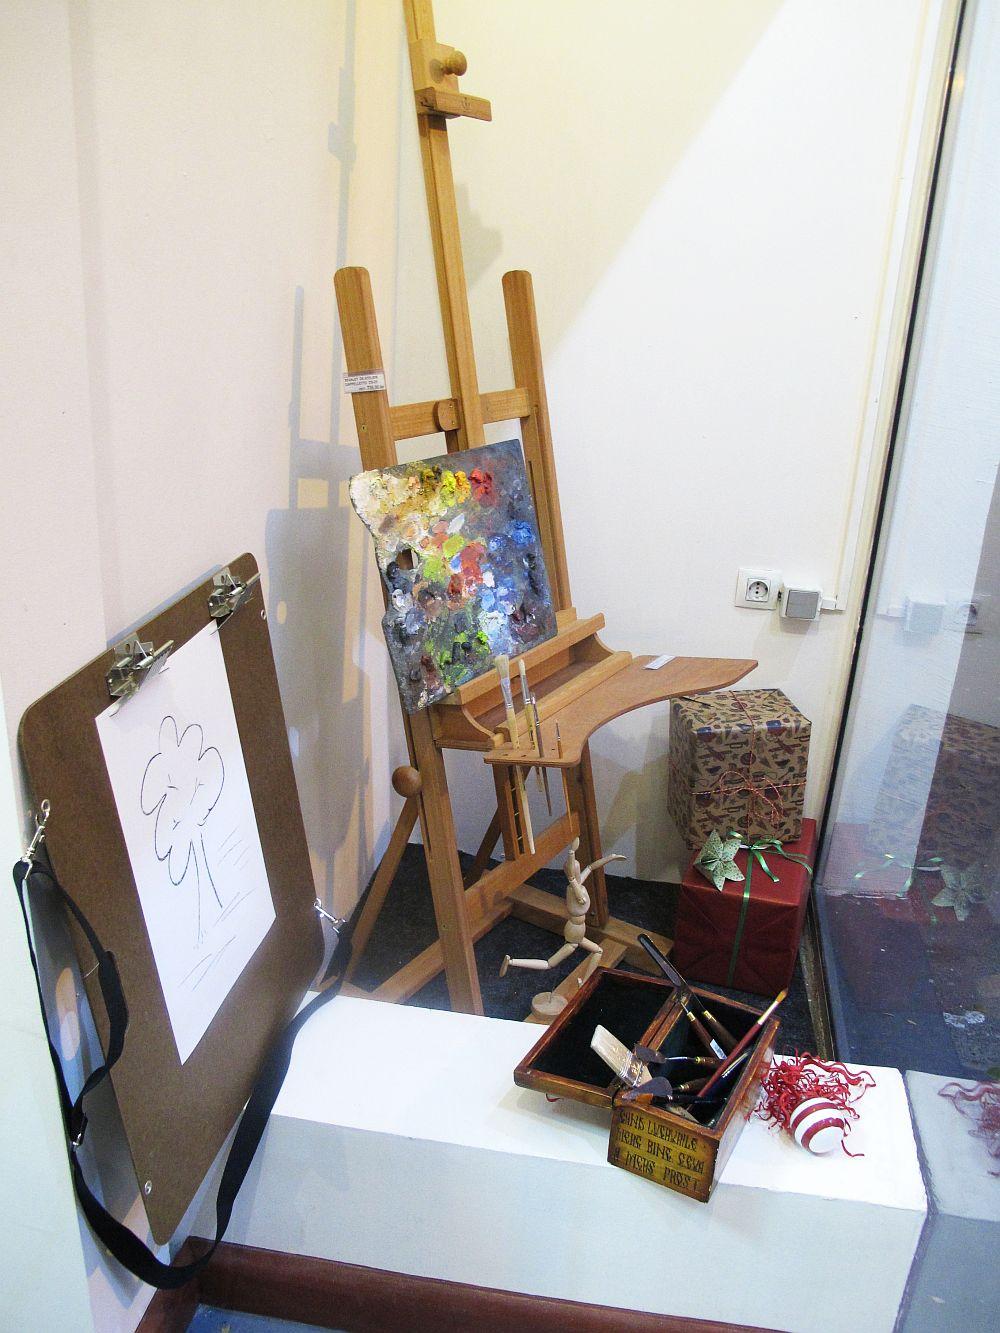 adelaparvu.com about Colorit new art&crafts shop in Bucharest (2)